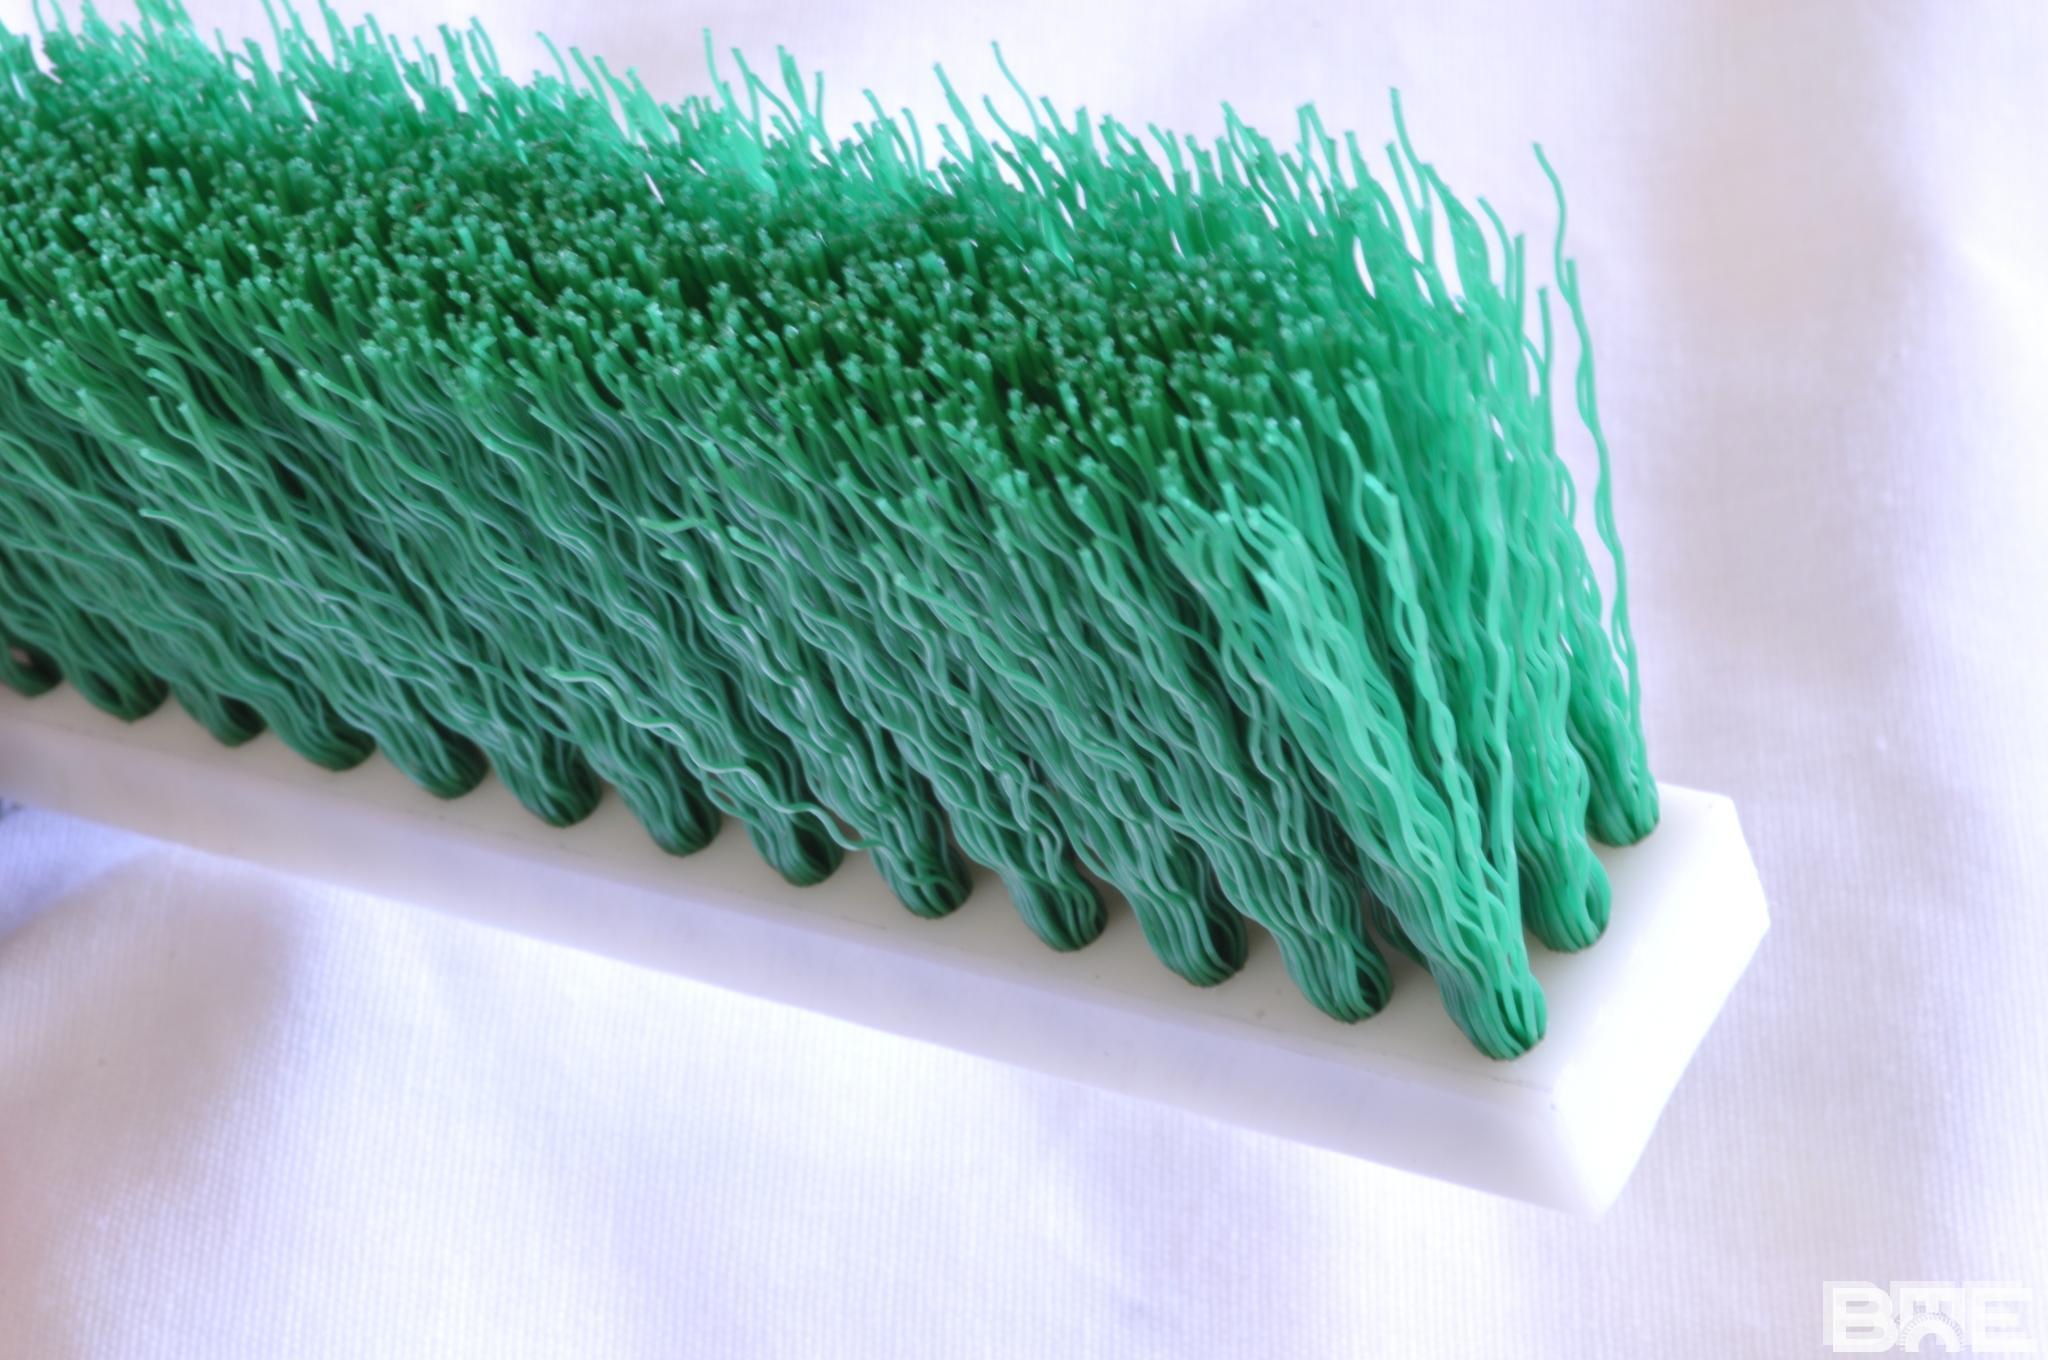 Brosse plate nylon ondulé